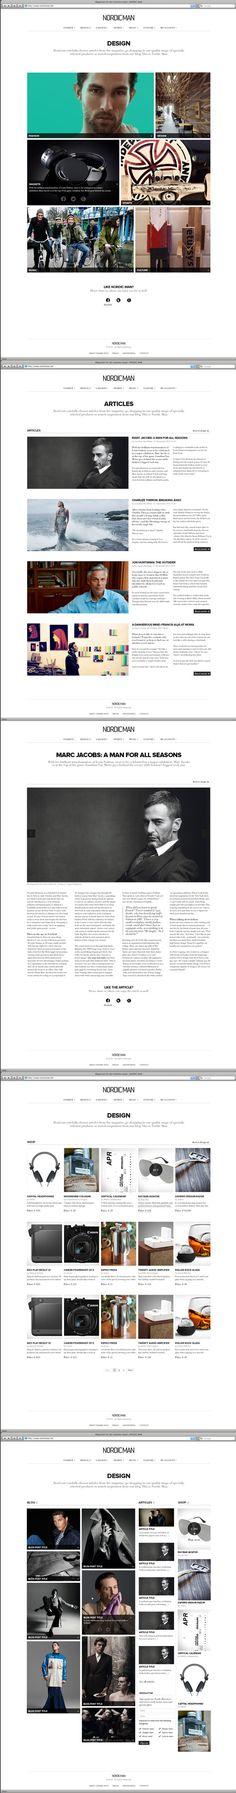 #web, #magazine, #grid  http://www.webdesignserved.com/gallery/Nordic-Man-Magazine/4665111